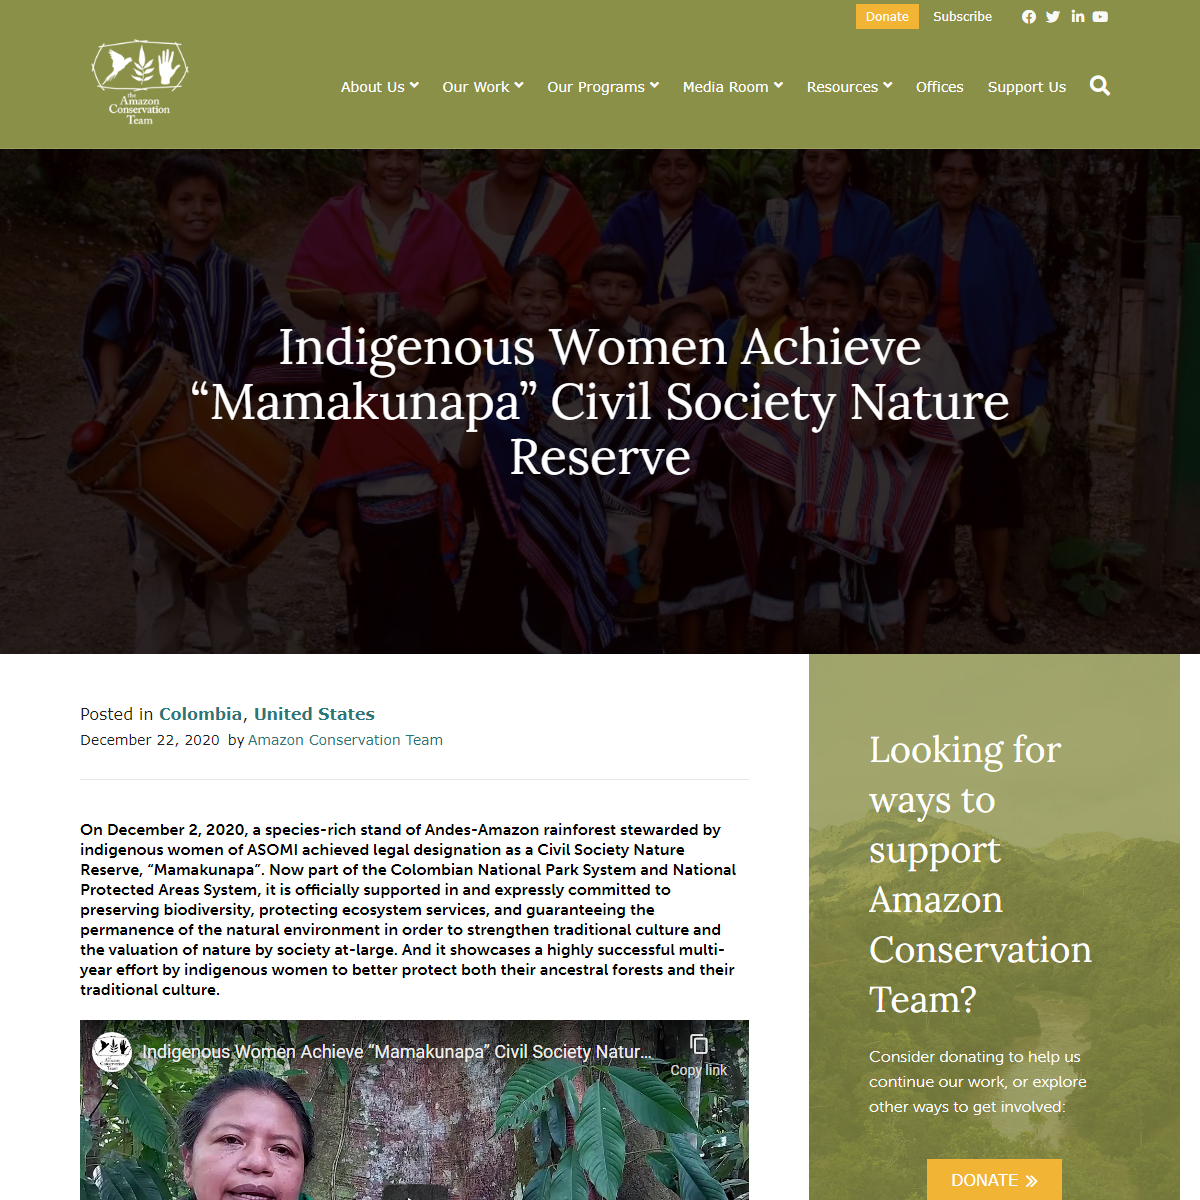 "Indigenous Women Achieve ""Mamakunapa"" Civil Society Nature Reserve - Amazon Conservation Team"